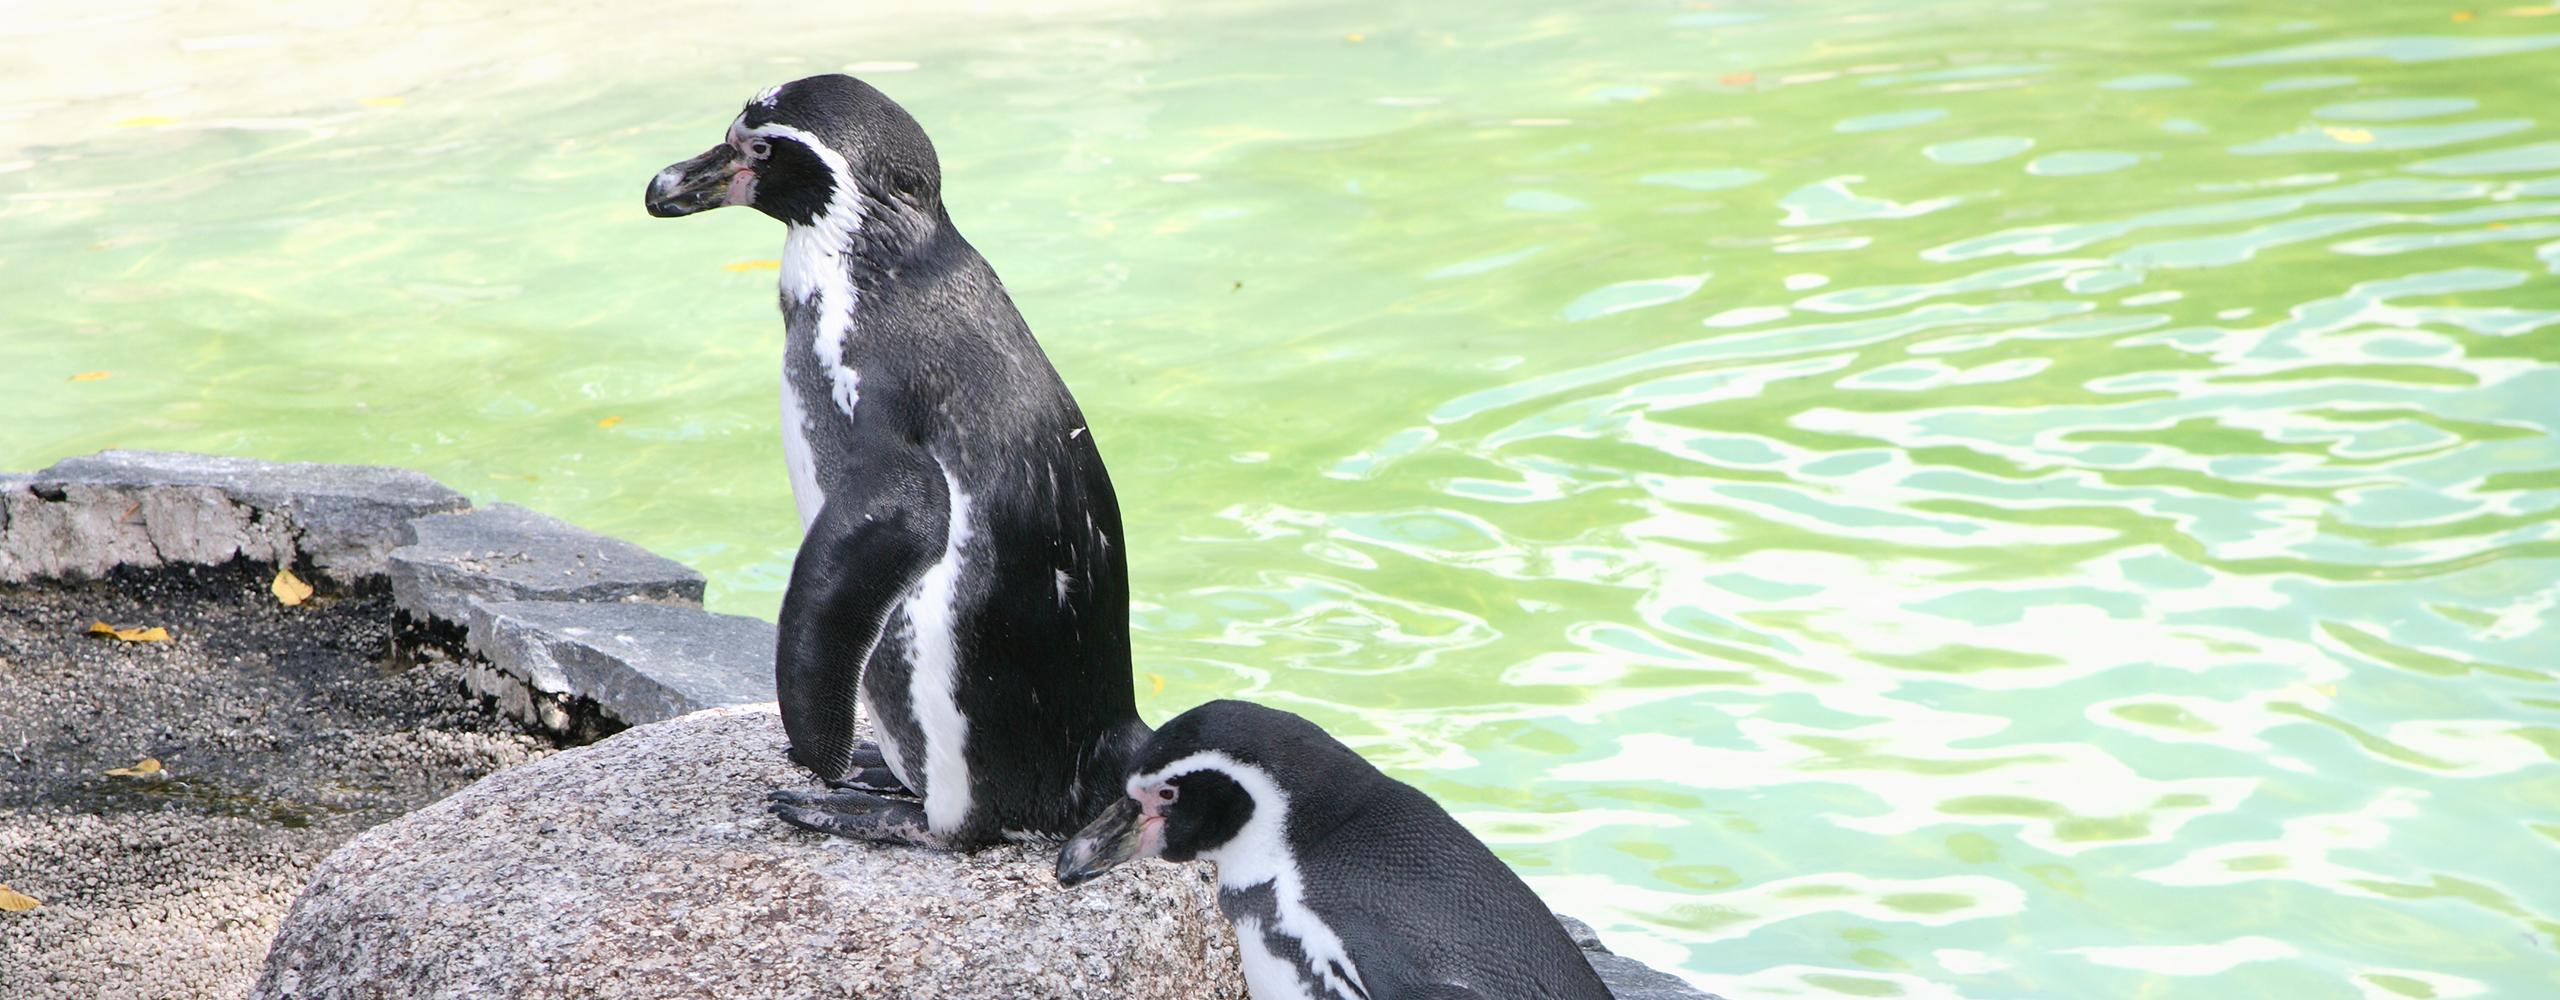 Humboldt-Pinguin | Luisenpark